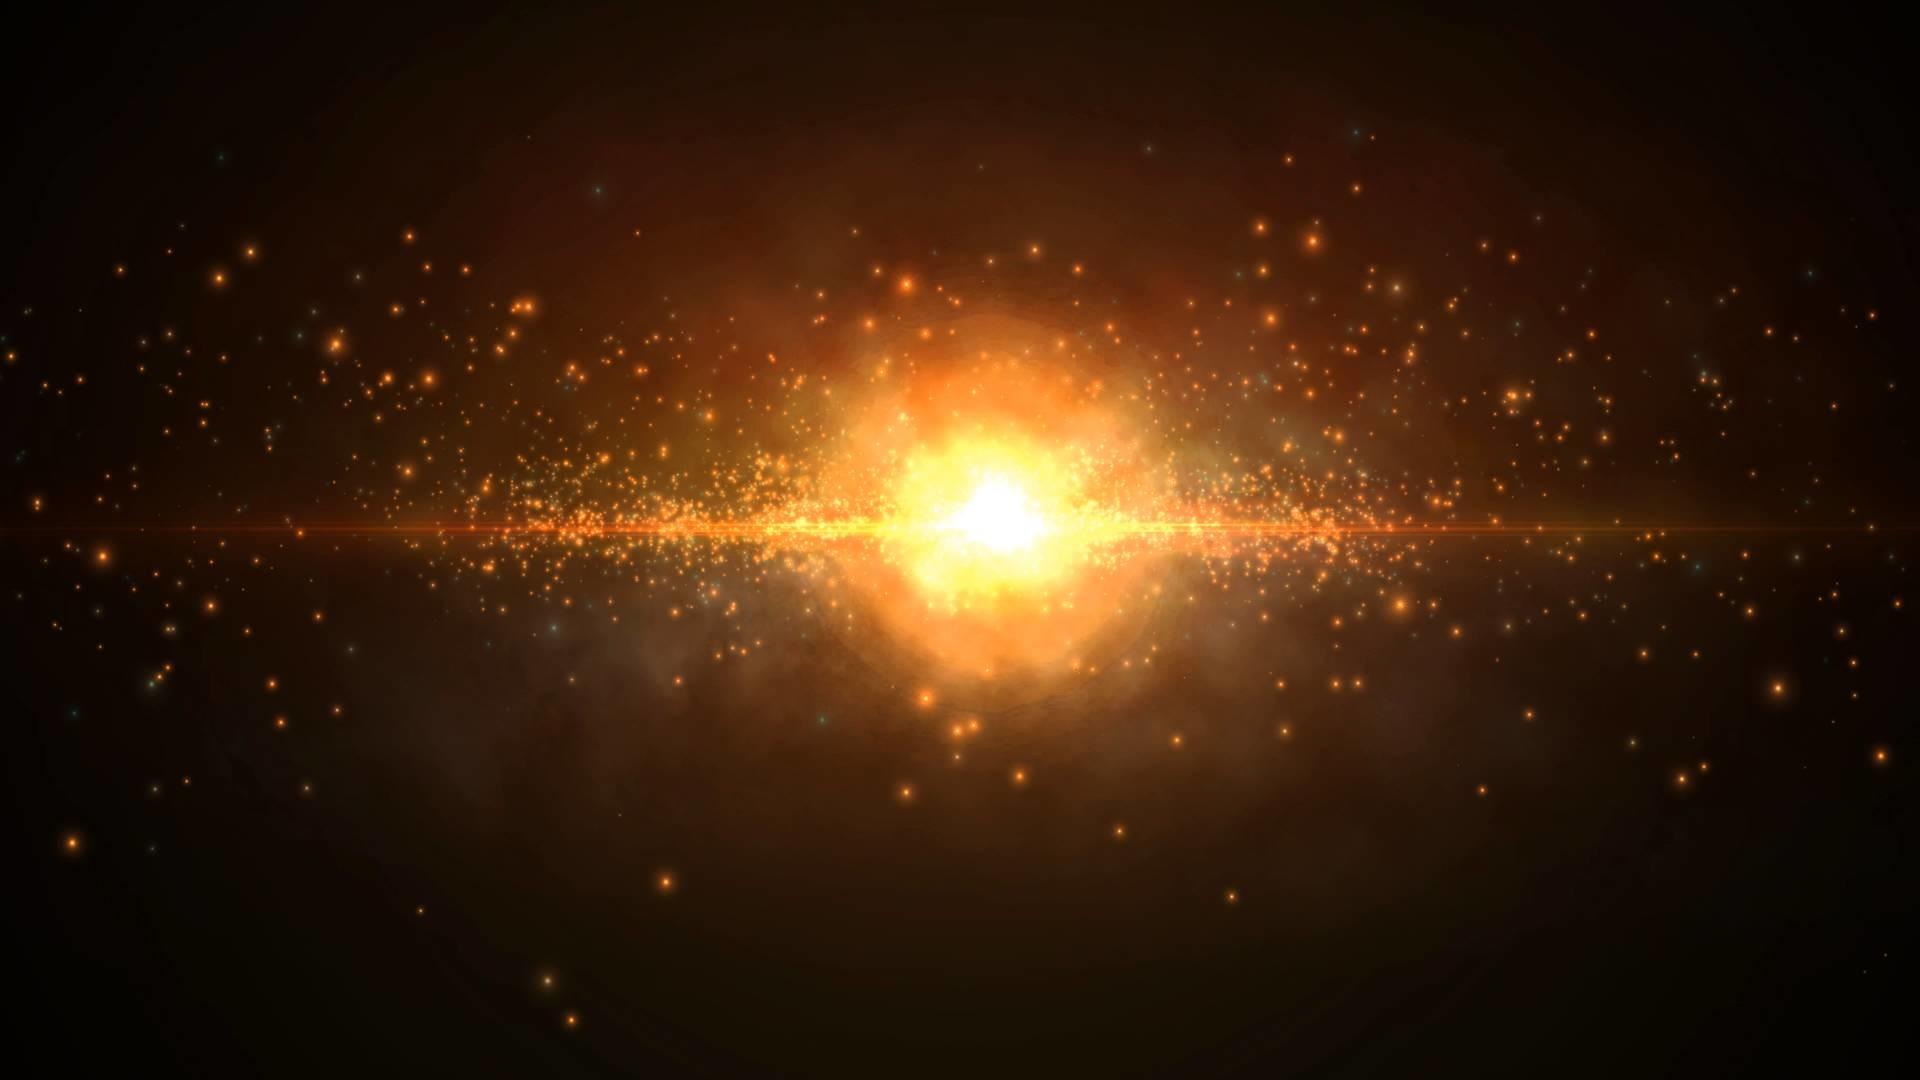 8K 4320p Galaxy Space Stars Remake Animation UHD HD Background